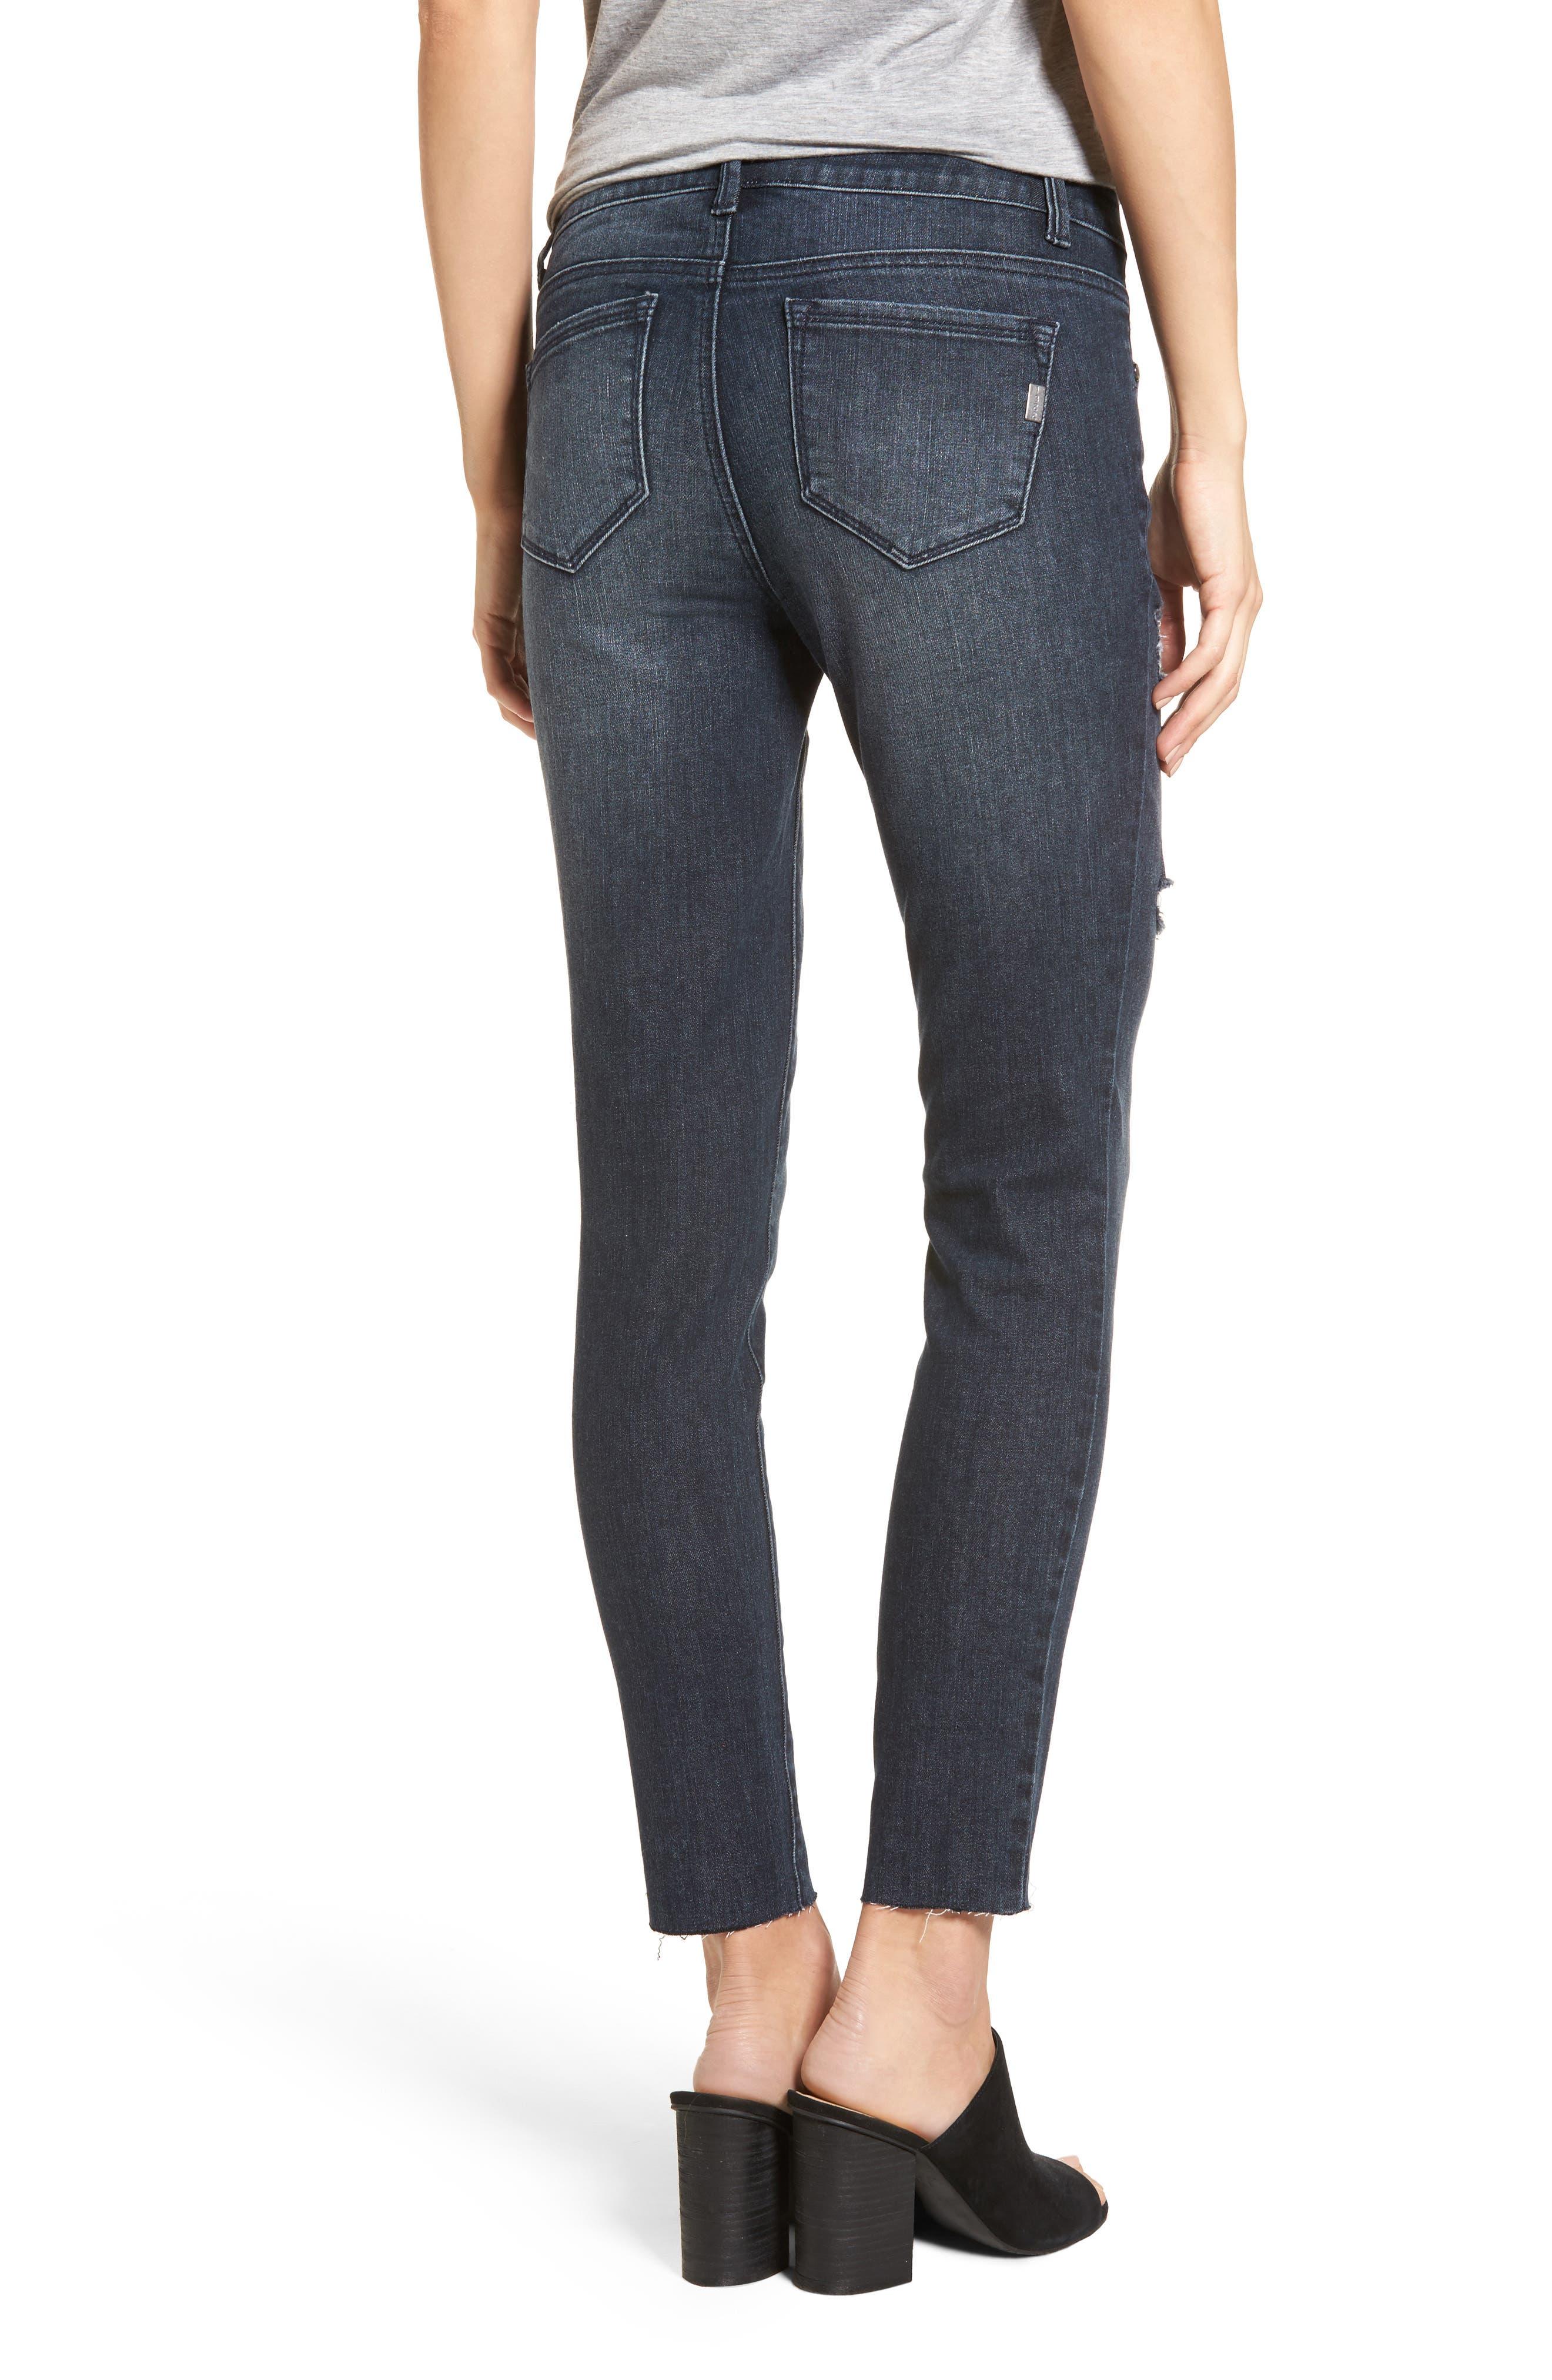 Alternate Image 2  - 1822 Denim Distressed Skinny Jeans (Palin)